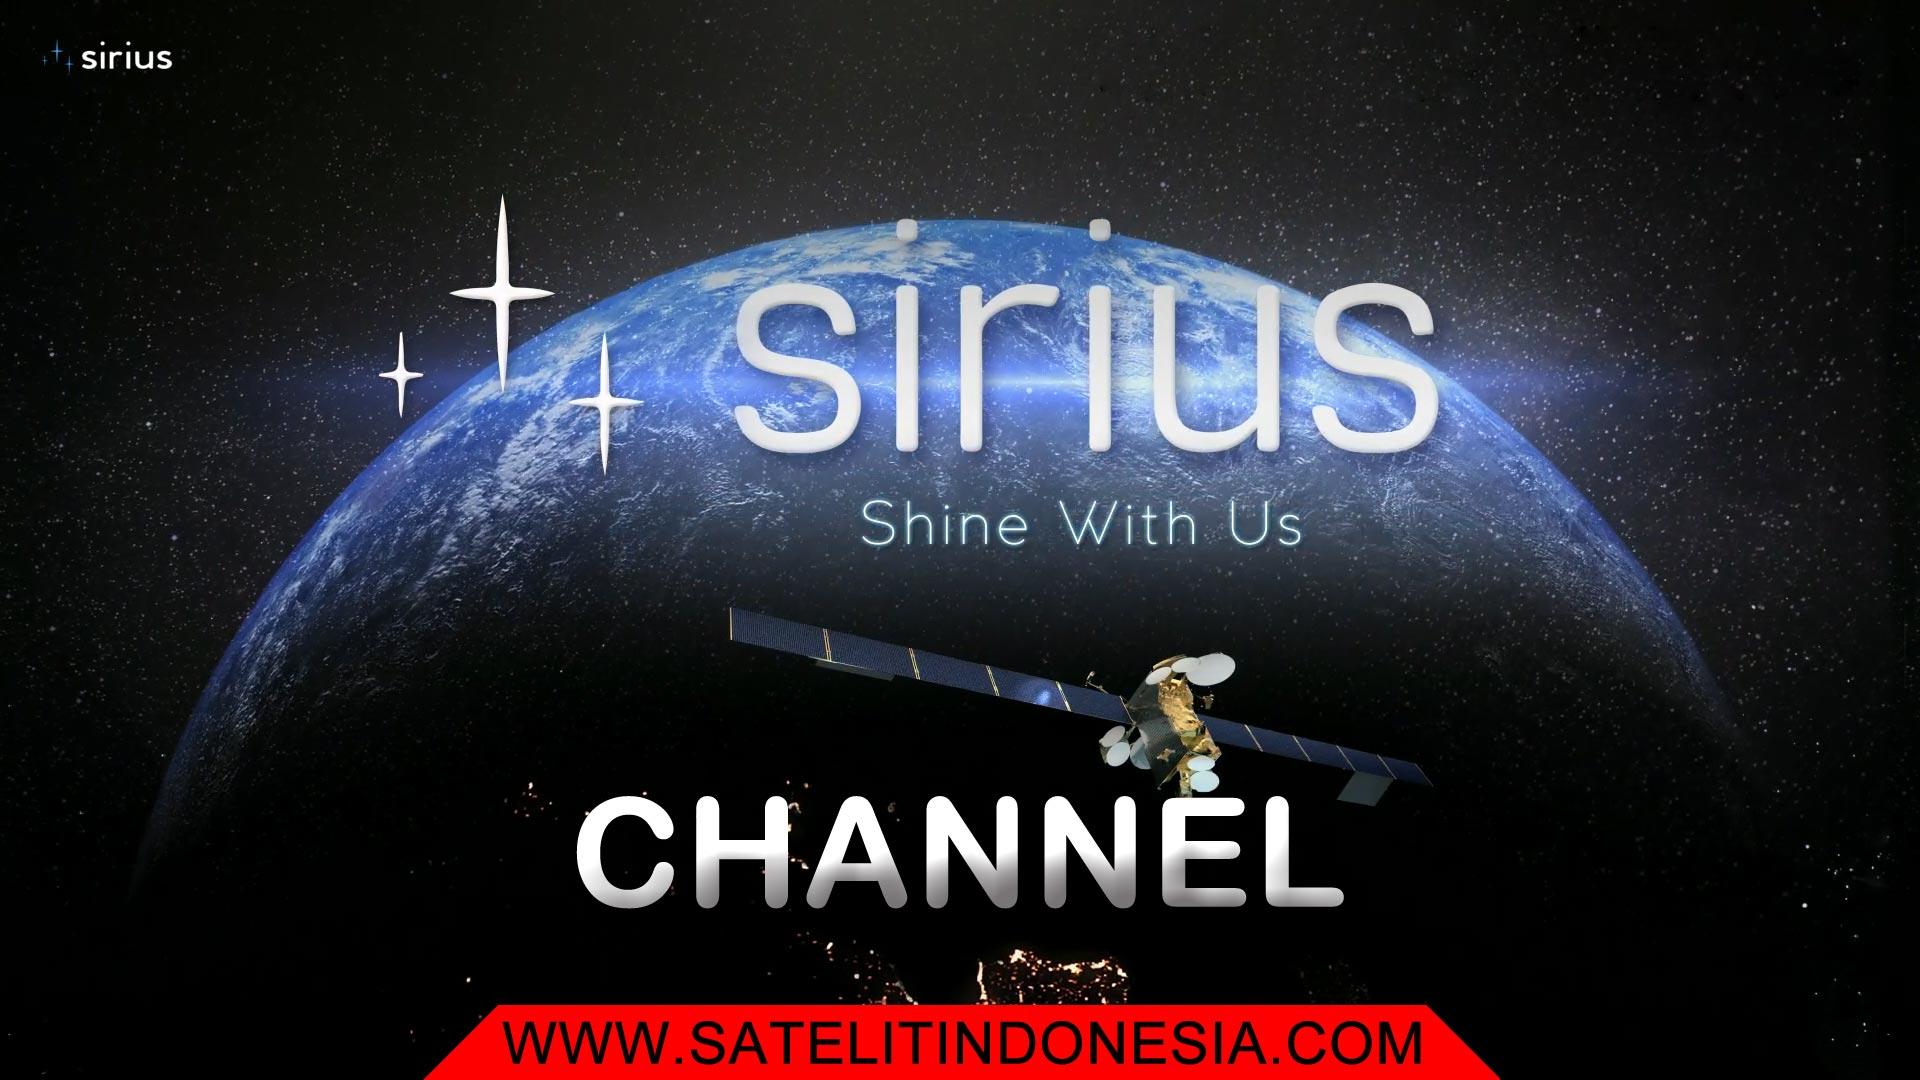 Sirius TV Malaysia Channels List SES 12 Satellite